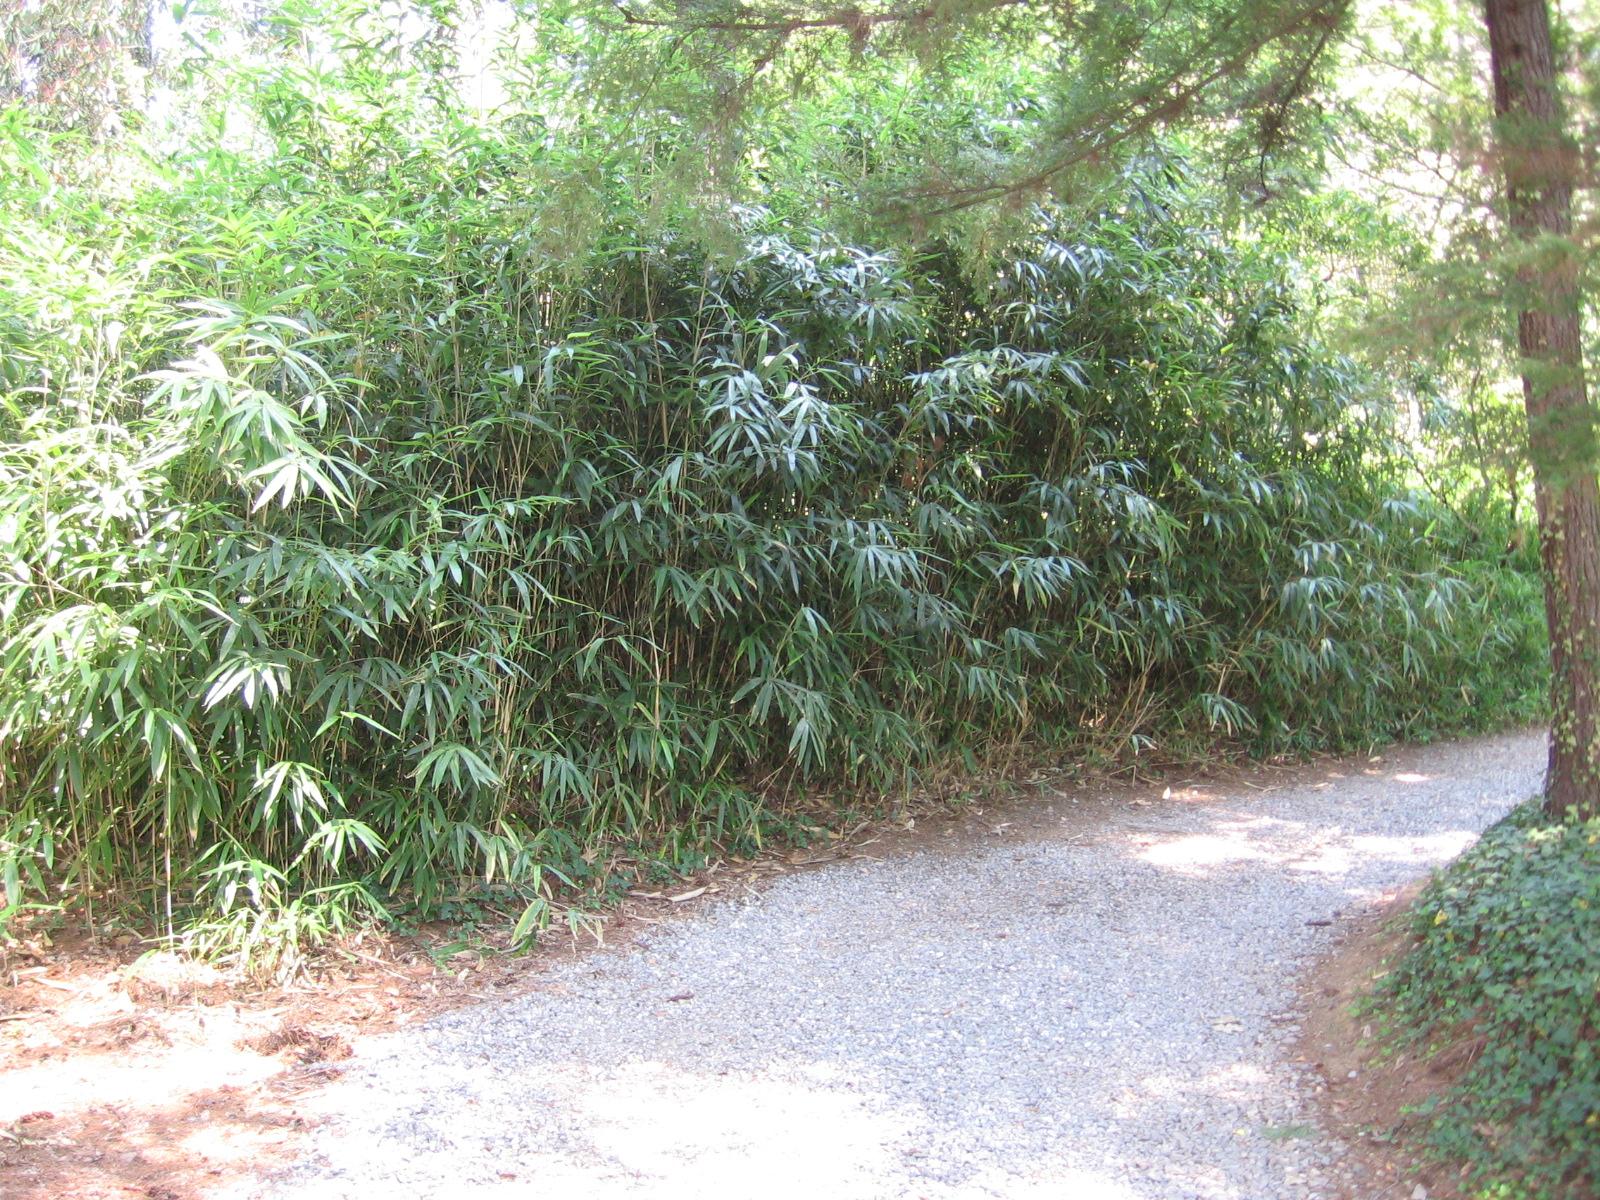 arrow bamboo pseudosasa japonica thigpen trail bamboo farm. Black Bedroom Furniture Sets. Home Design Ideas